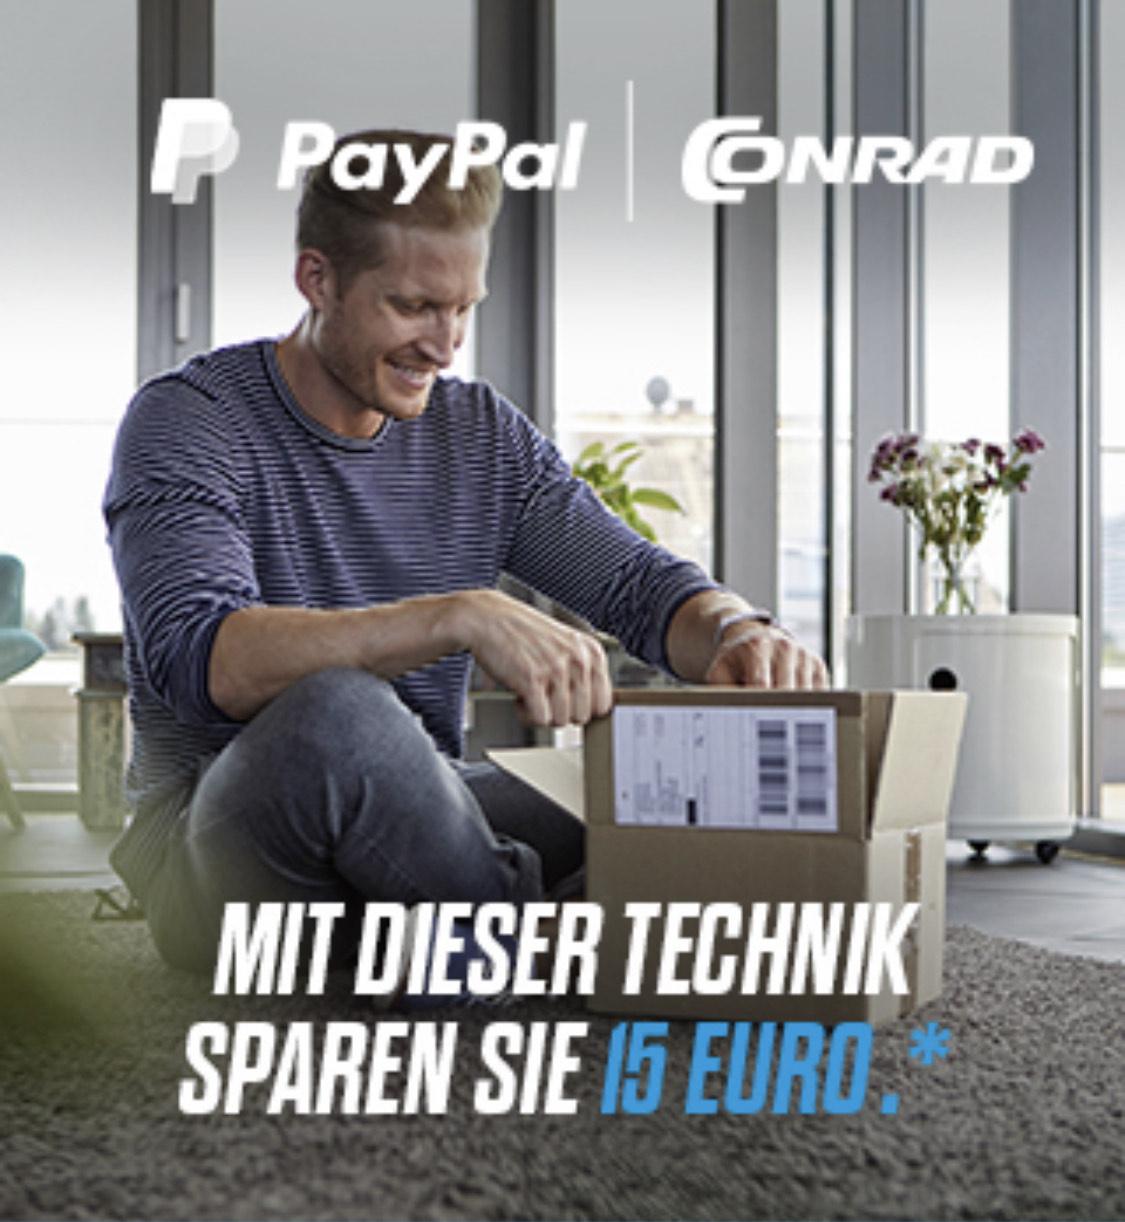 Conrad.at 15€ Rabatt ab 55€ MBW bei Zahlung via PayPal